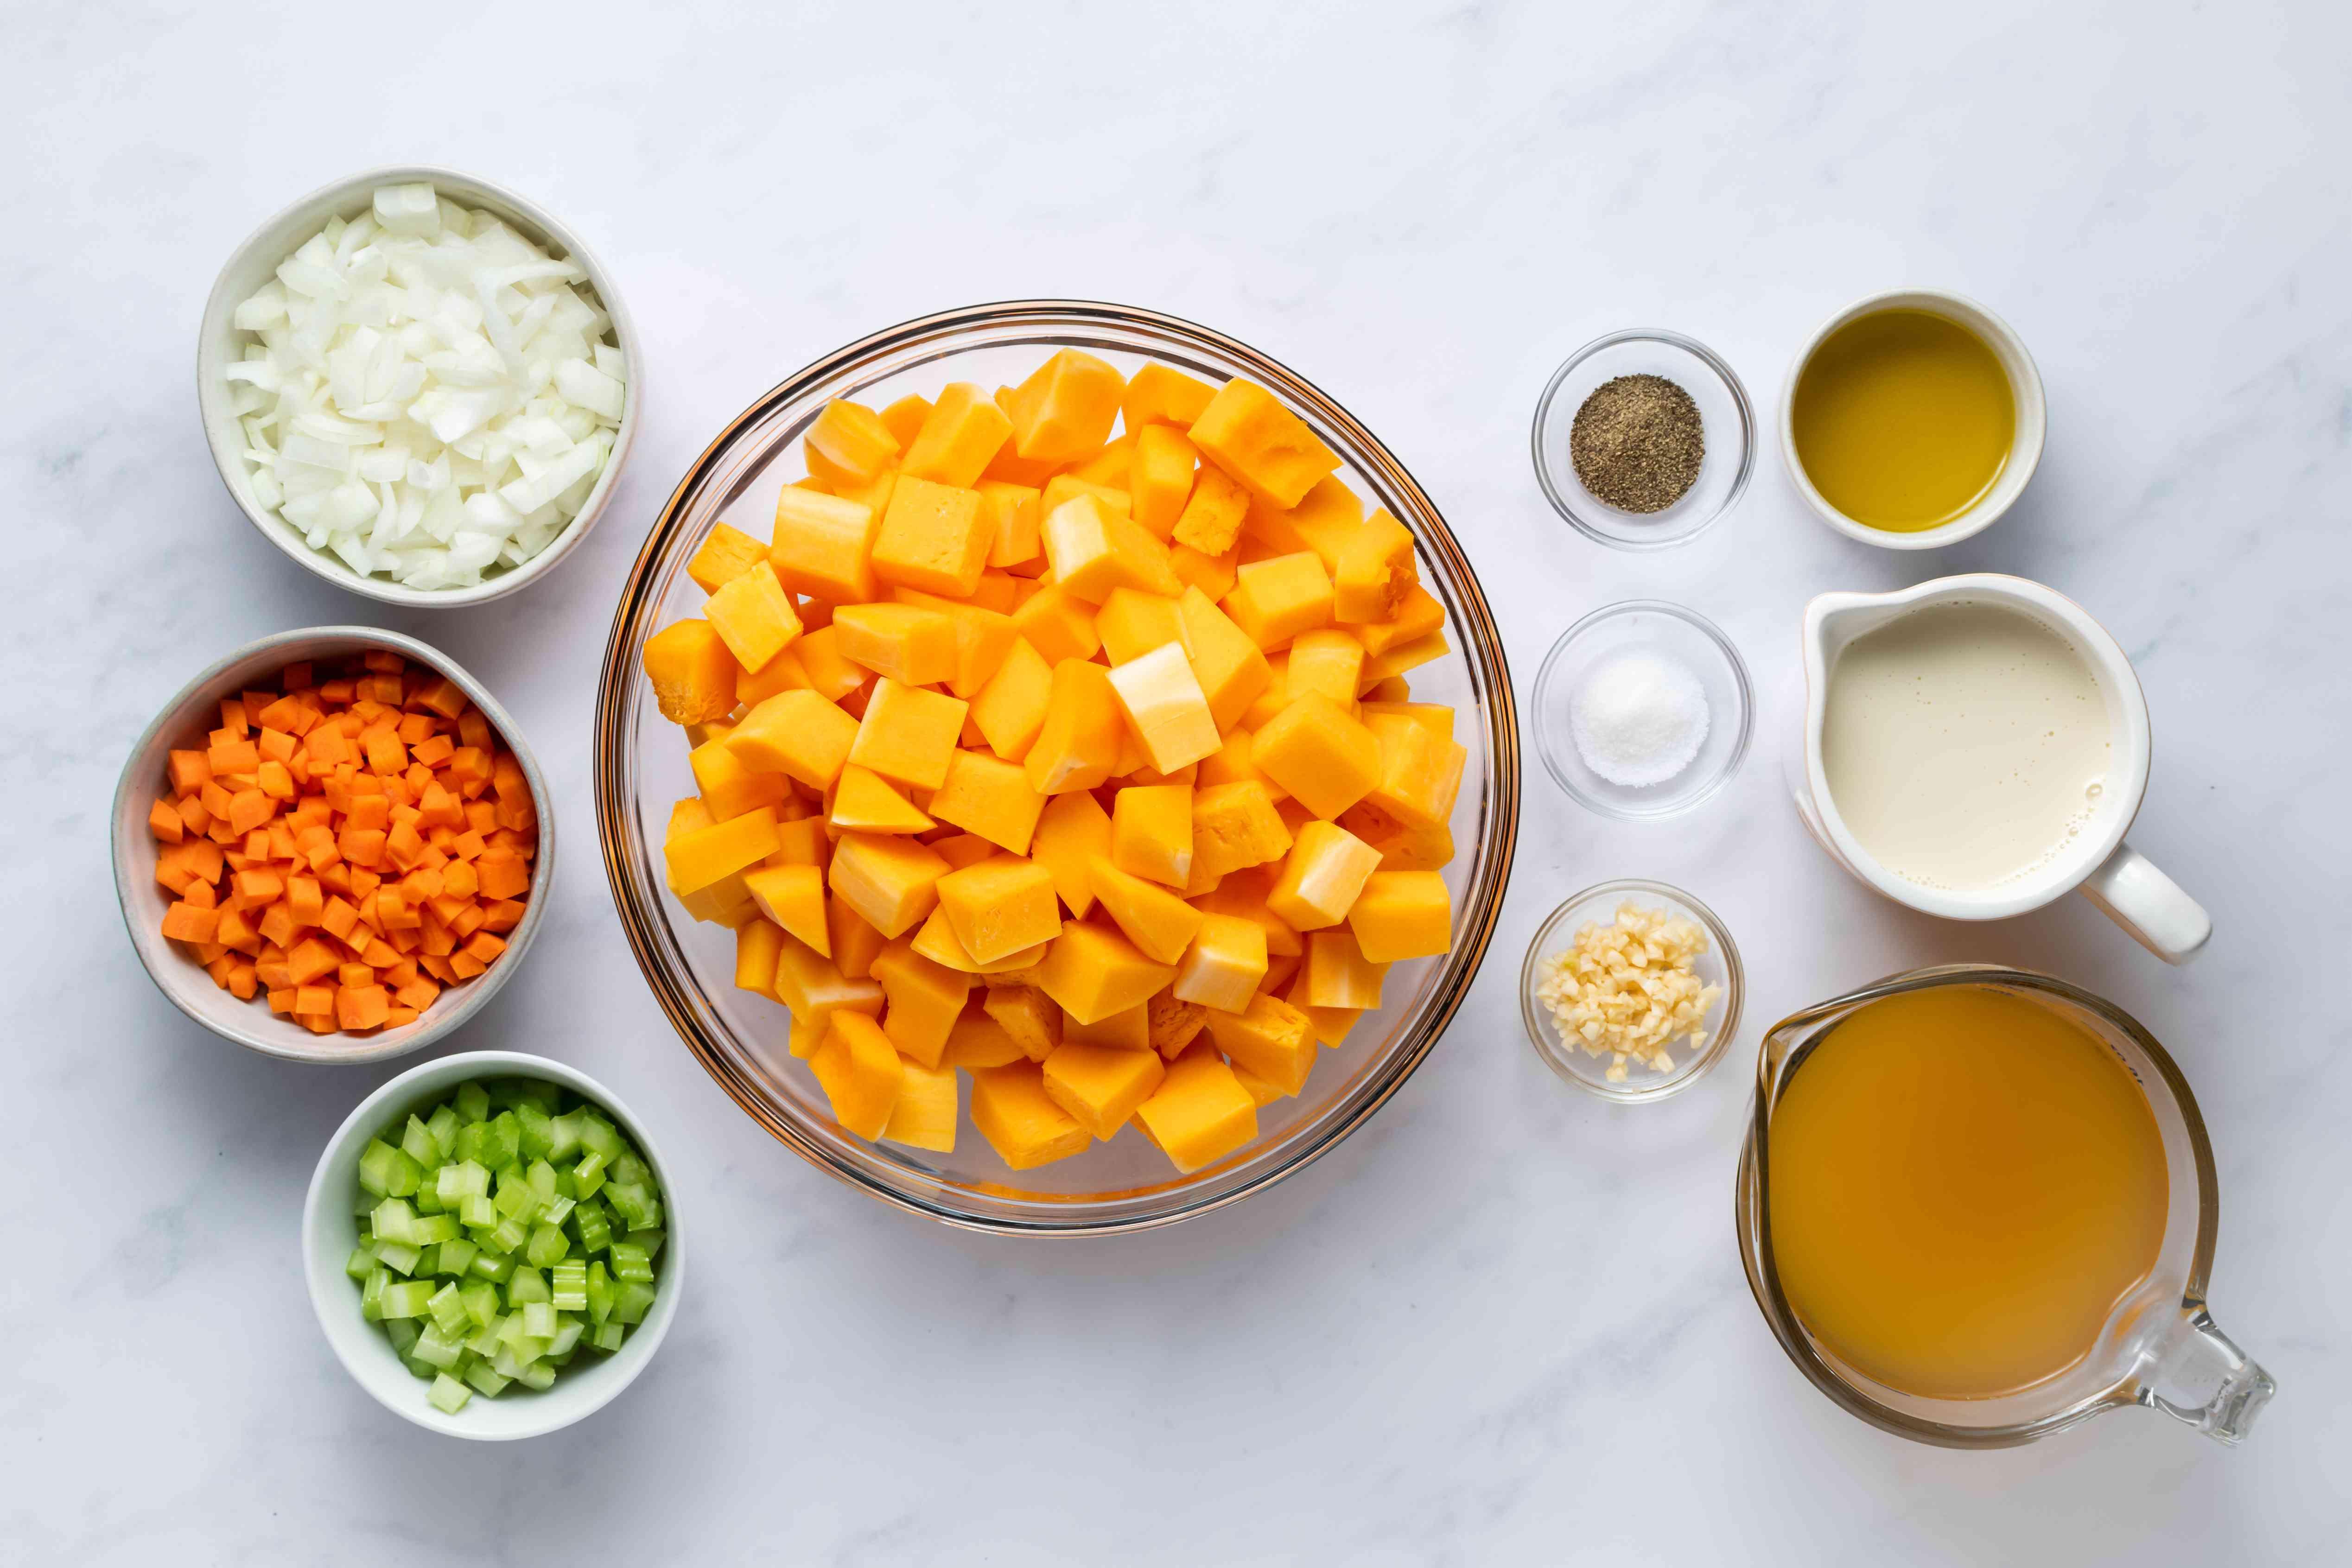 Butternut squash soup ingredients